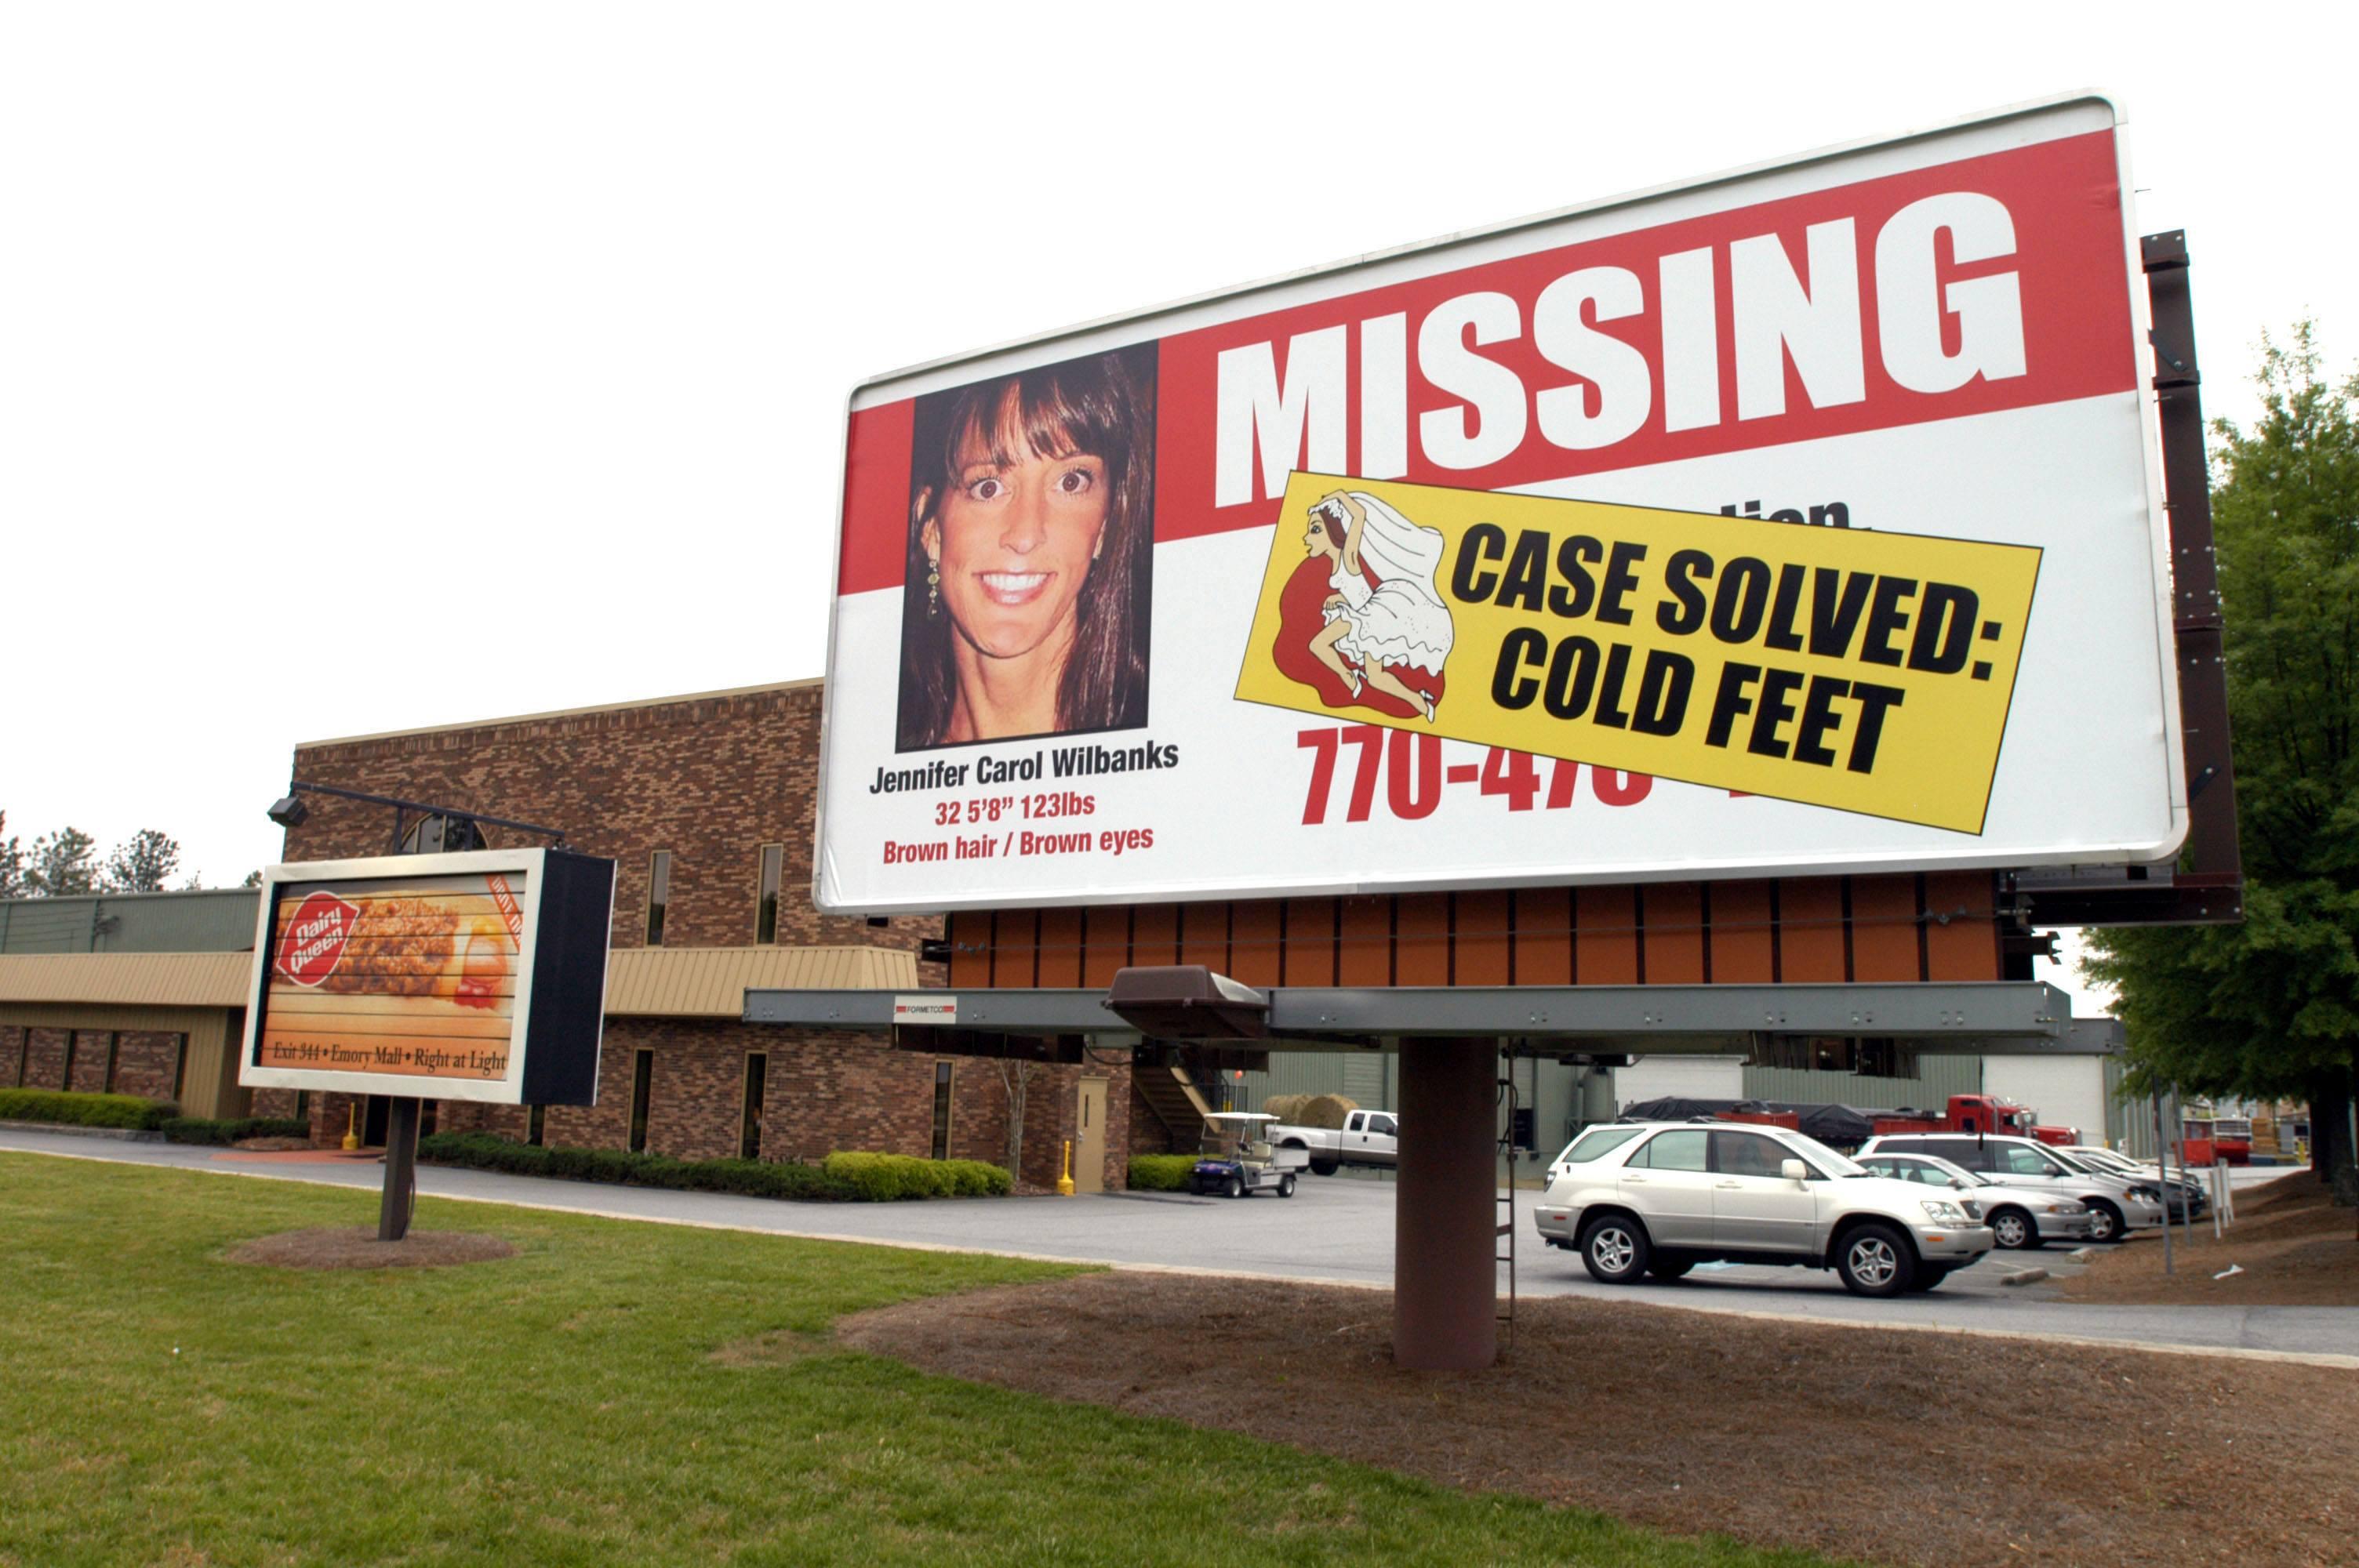 A missing persons billboard